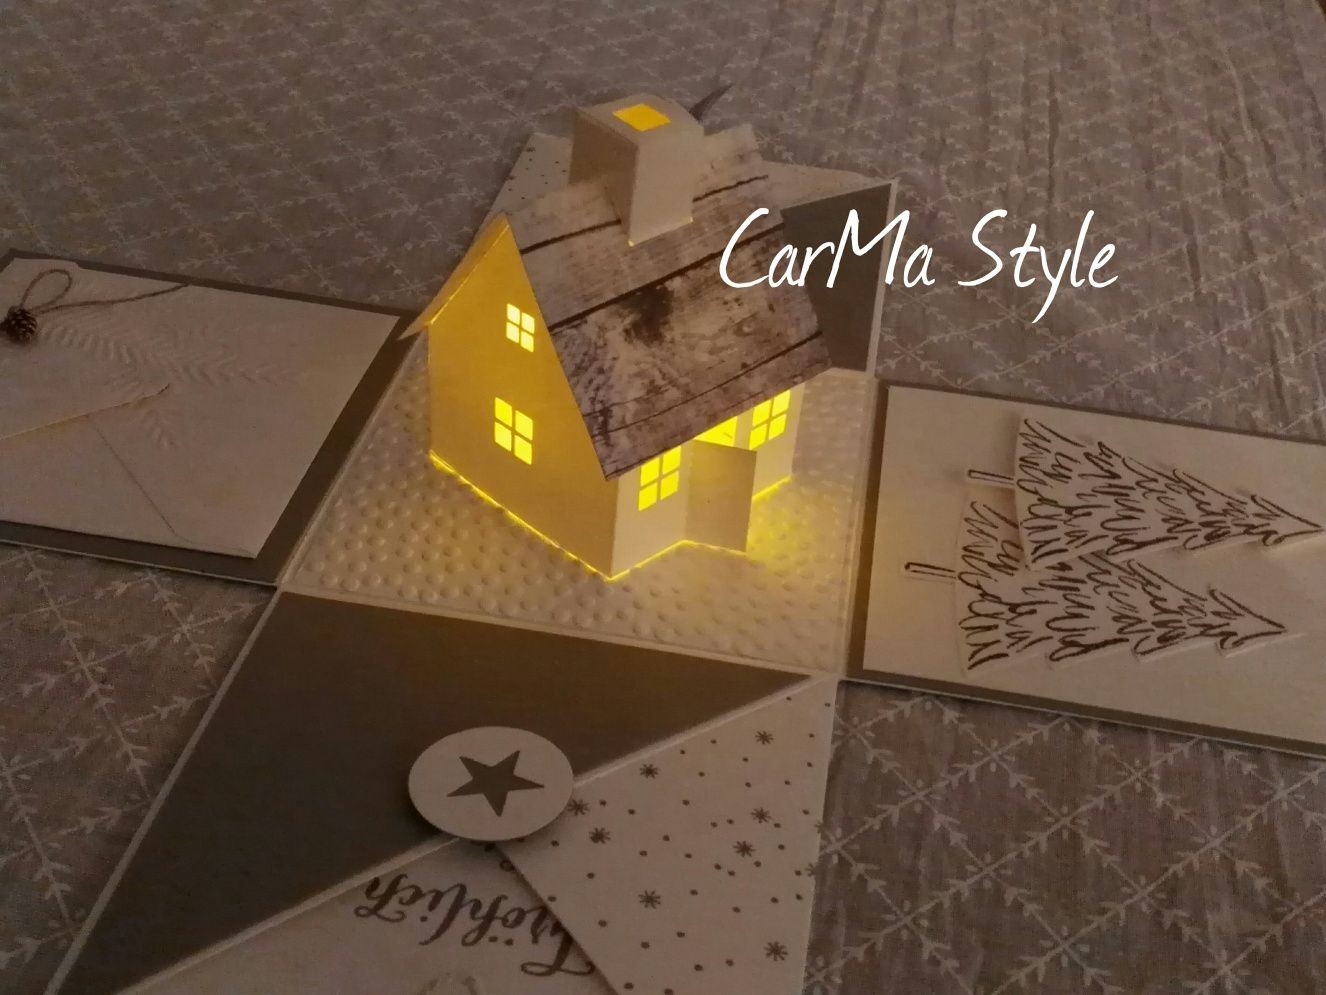 Explosionsbox – Seite 4 – CarMa Style explosinsbox